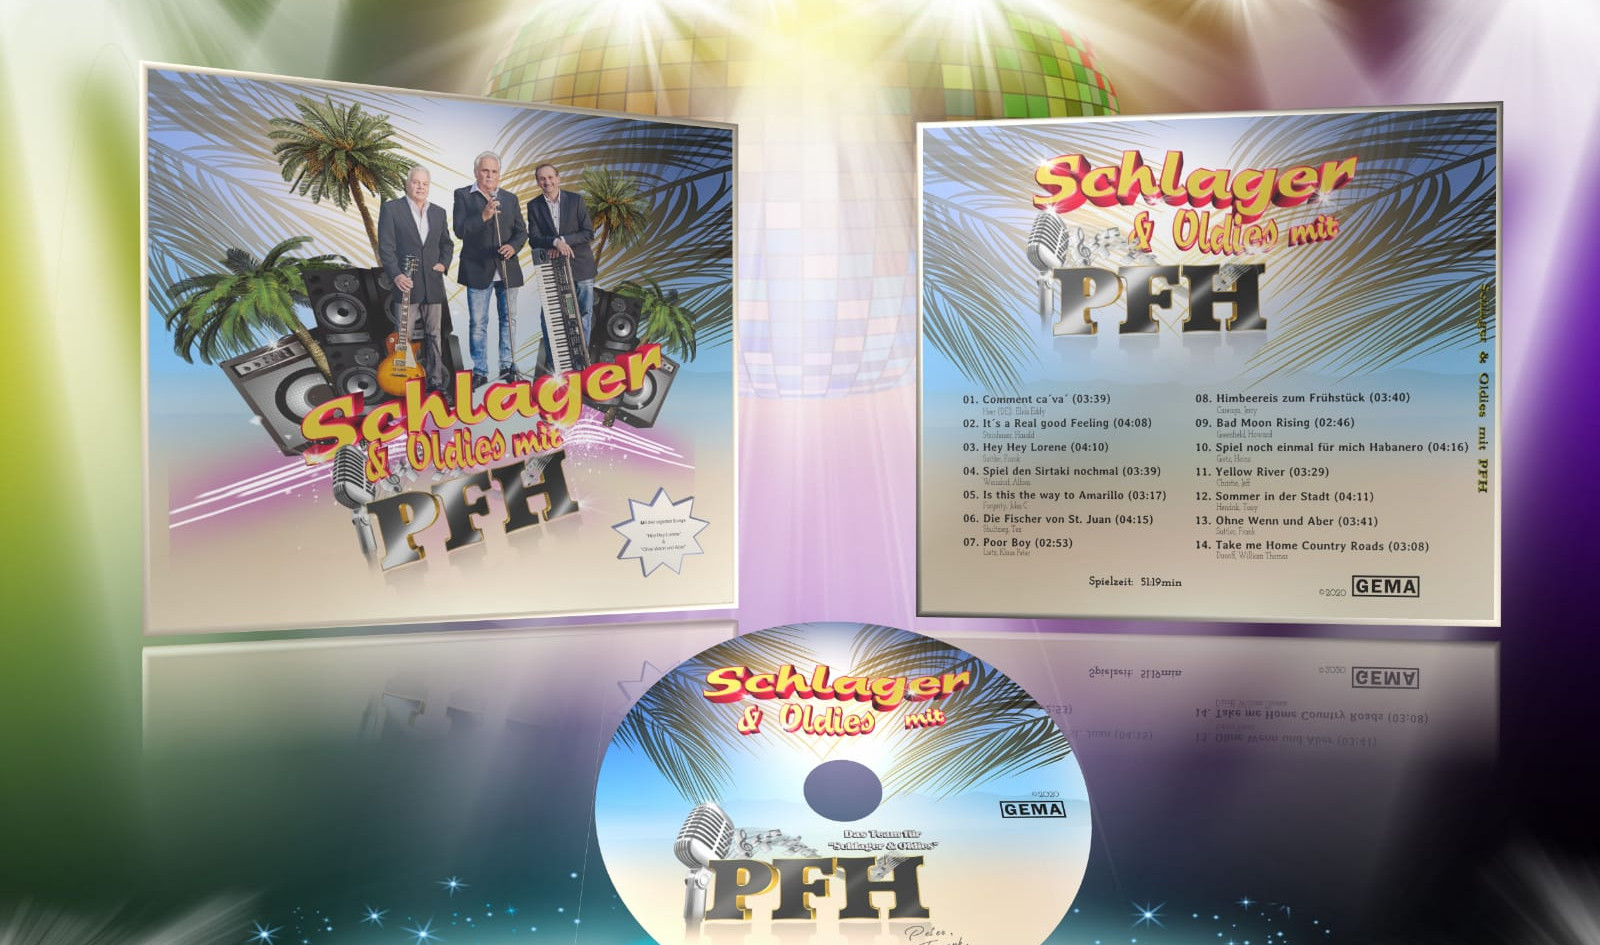 Schlager CD